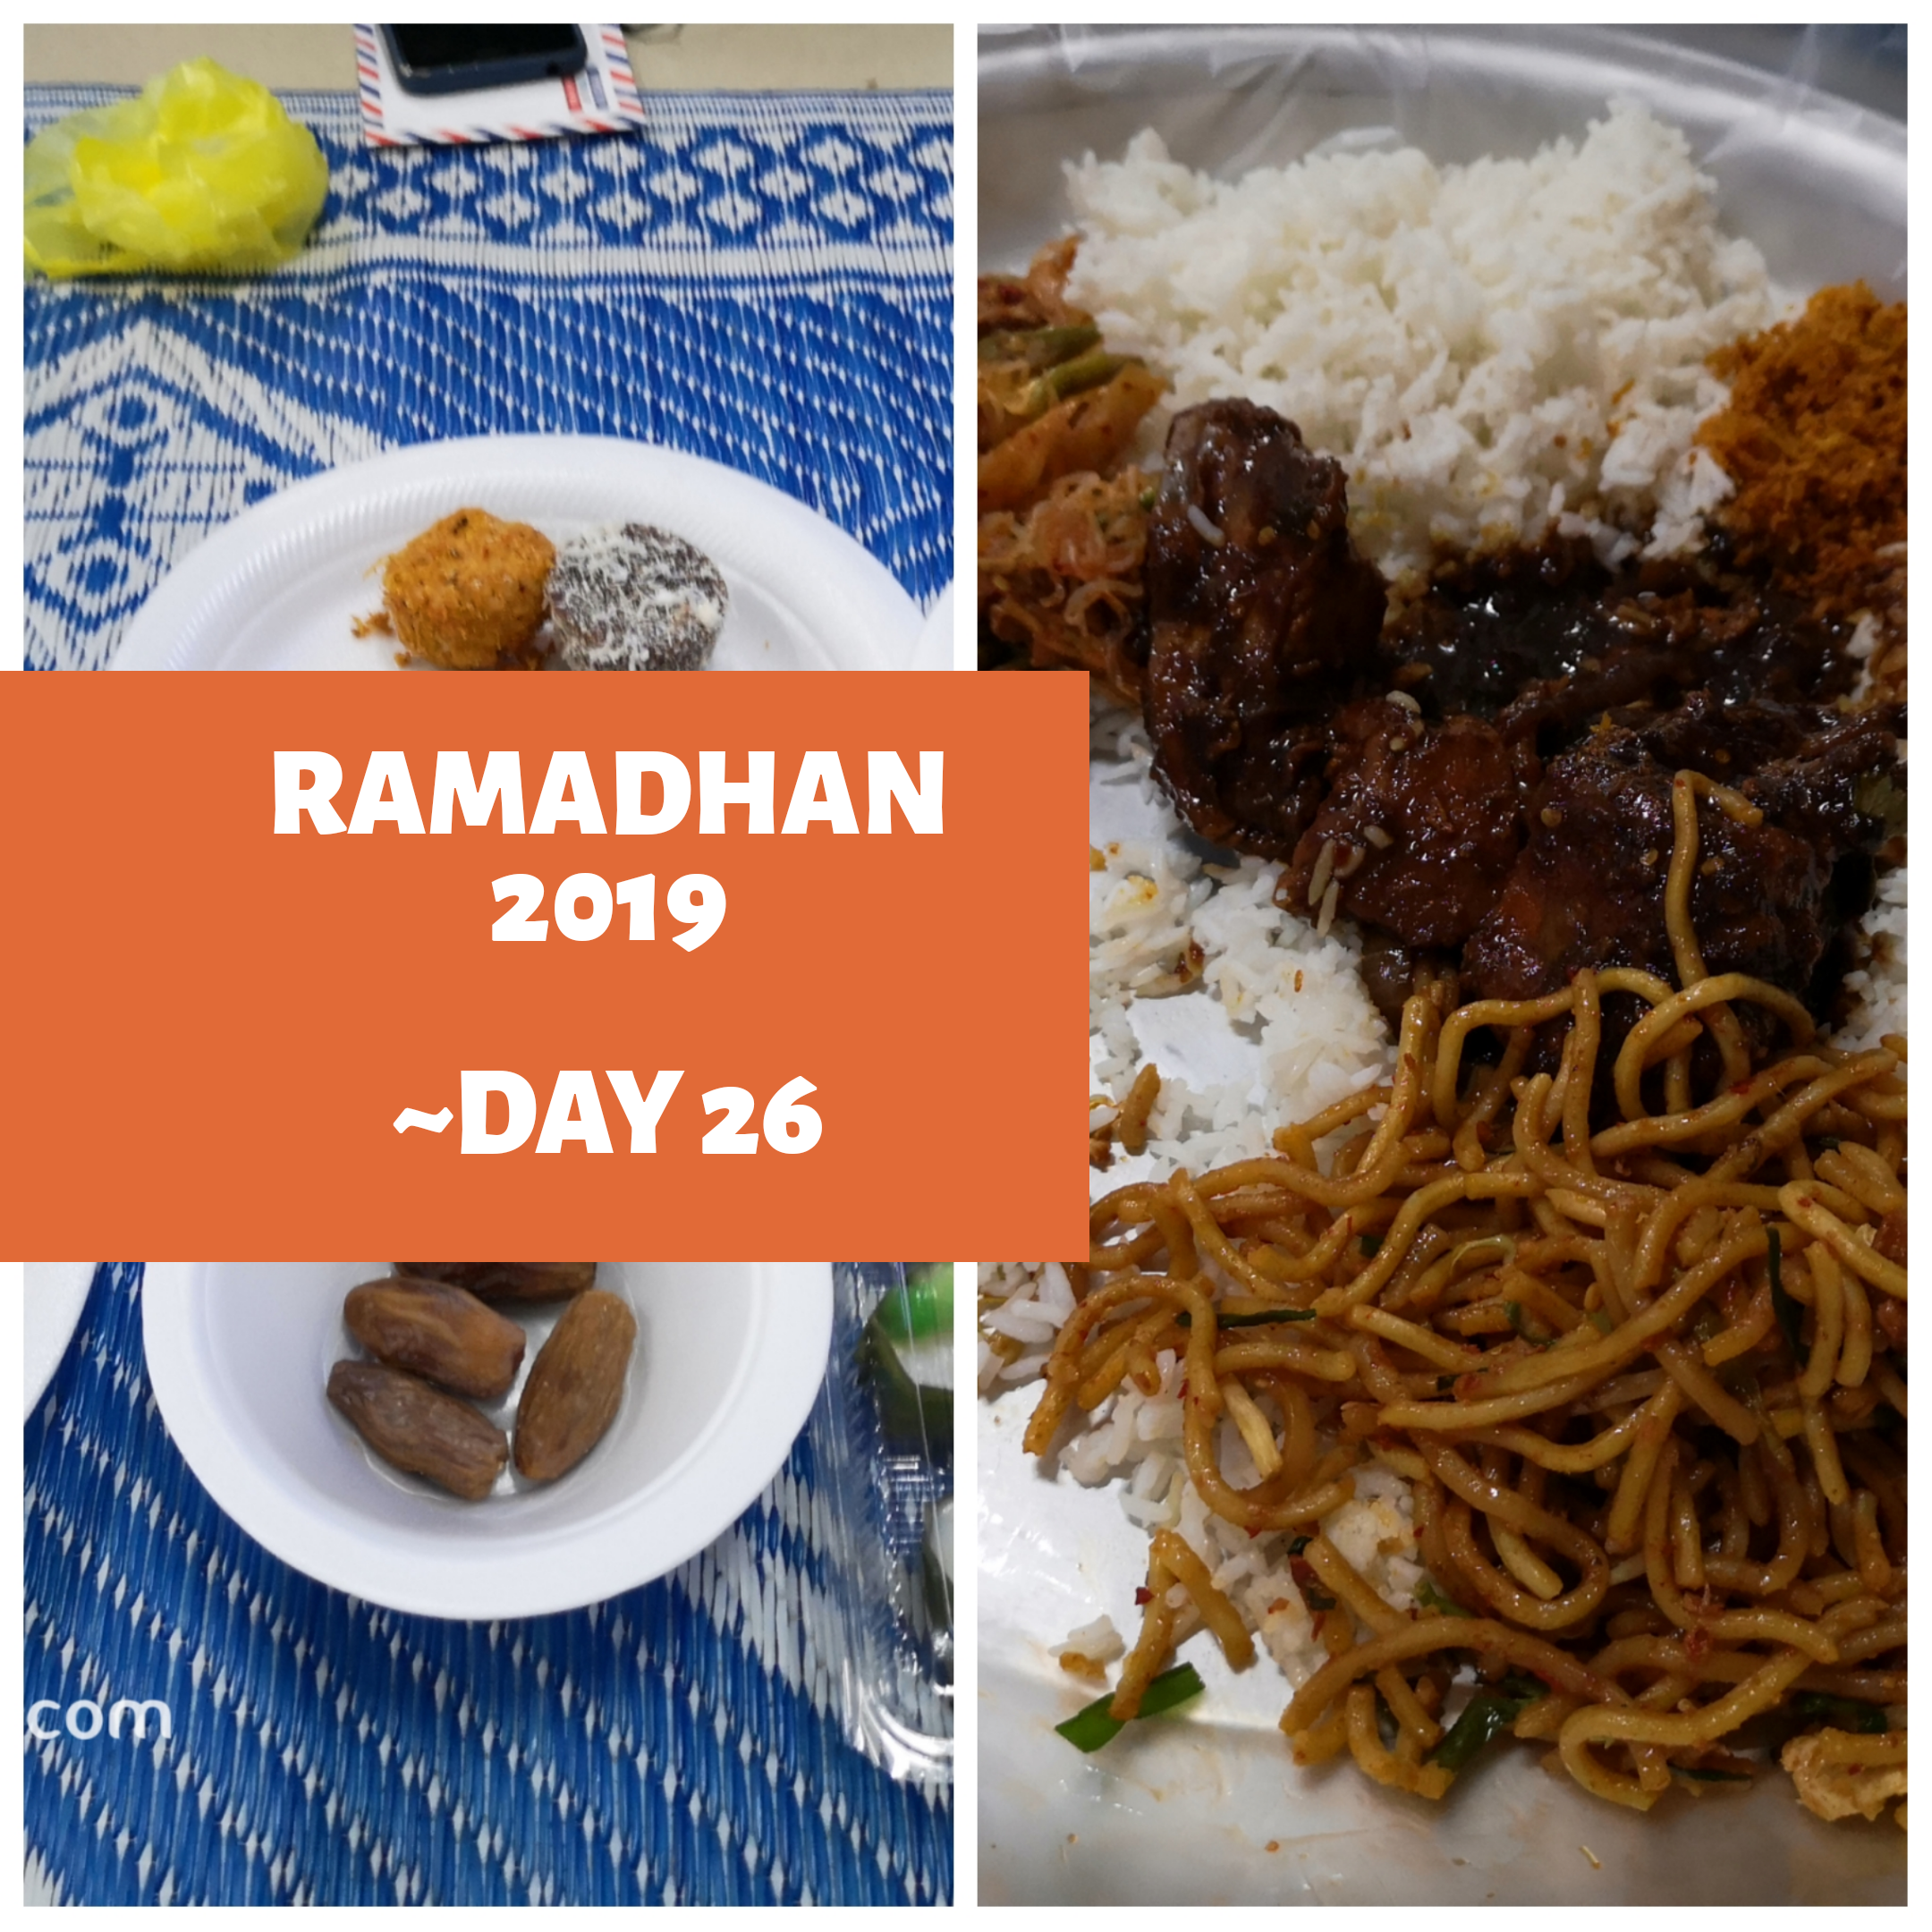 Ramadhan 2019 – Day 26